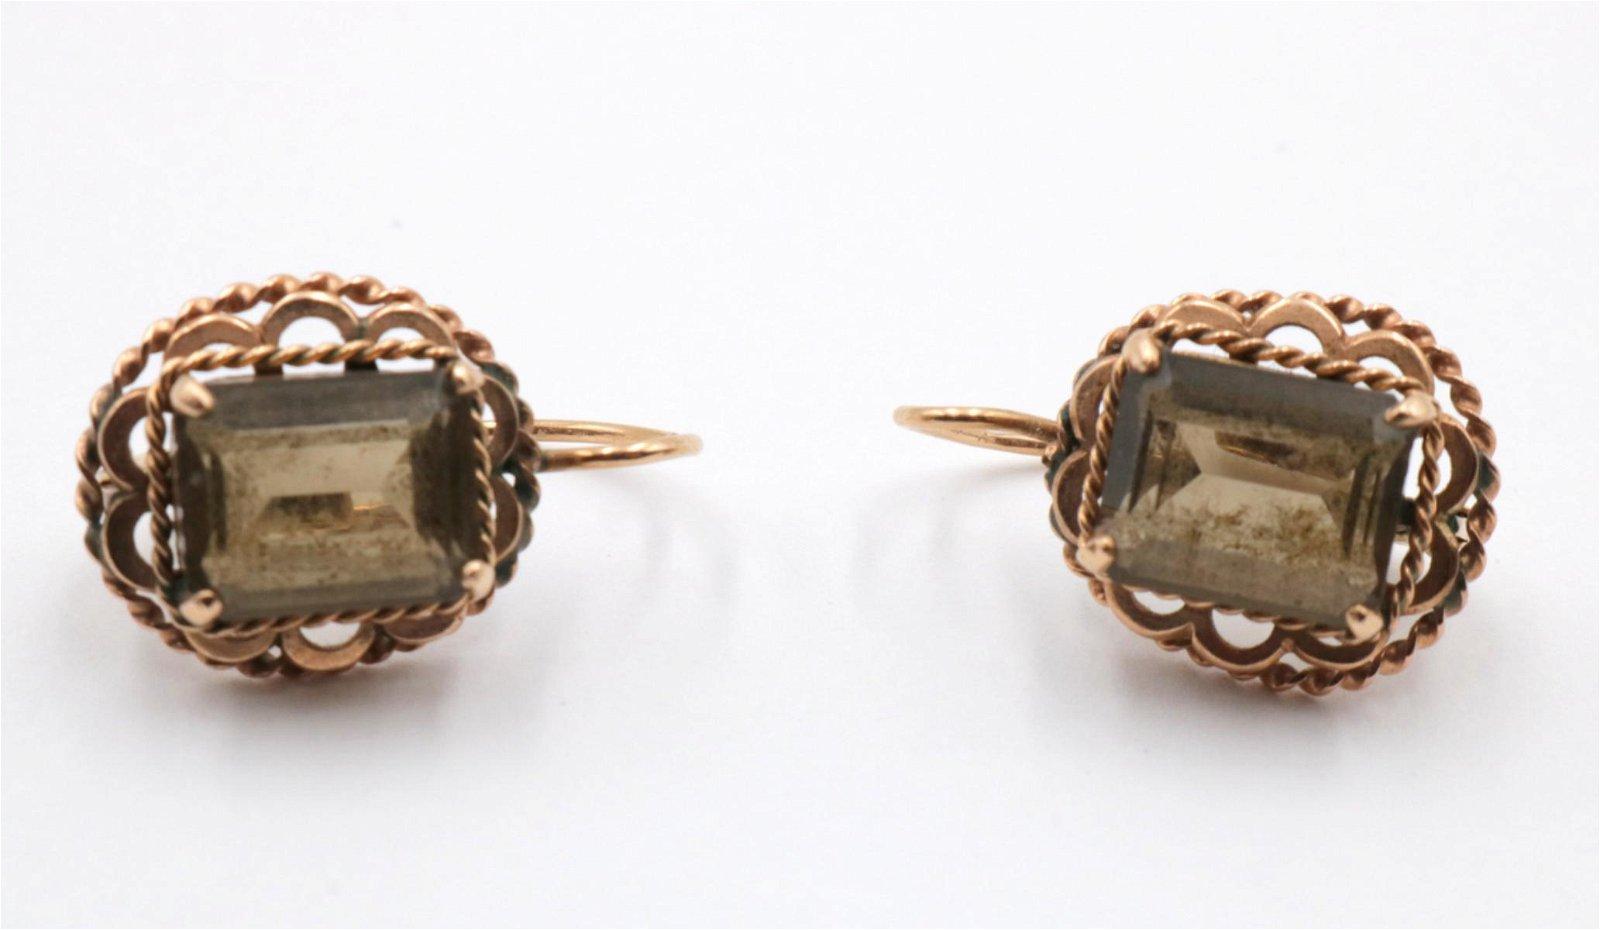 10Kt & Brown Topaz Earrings